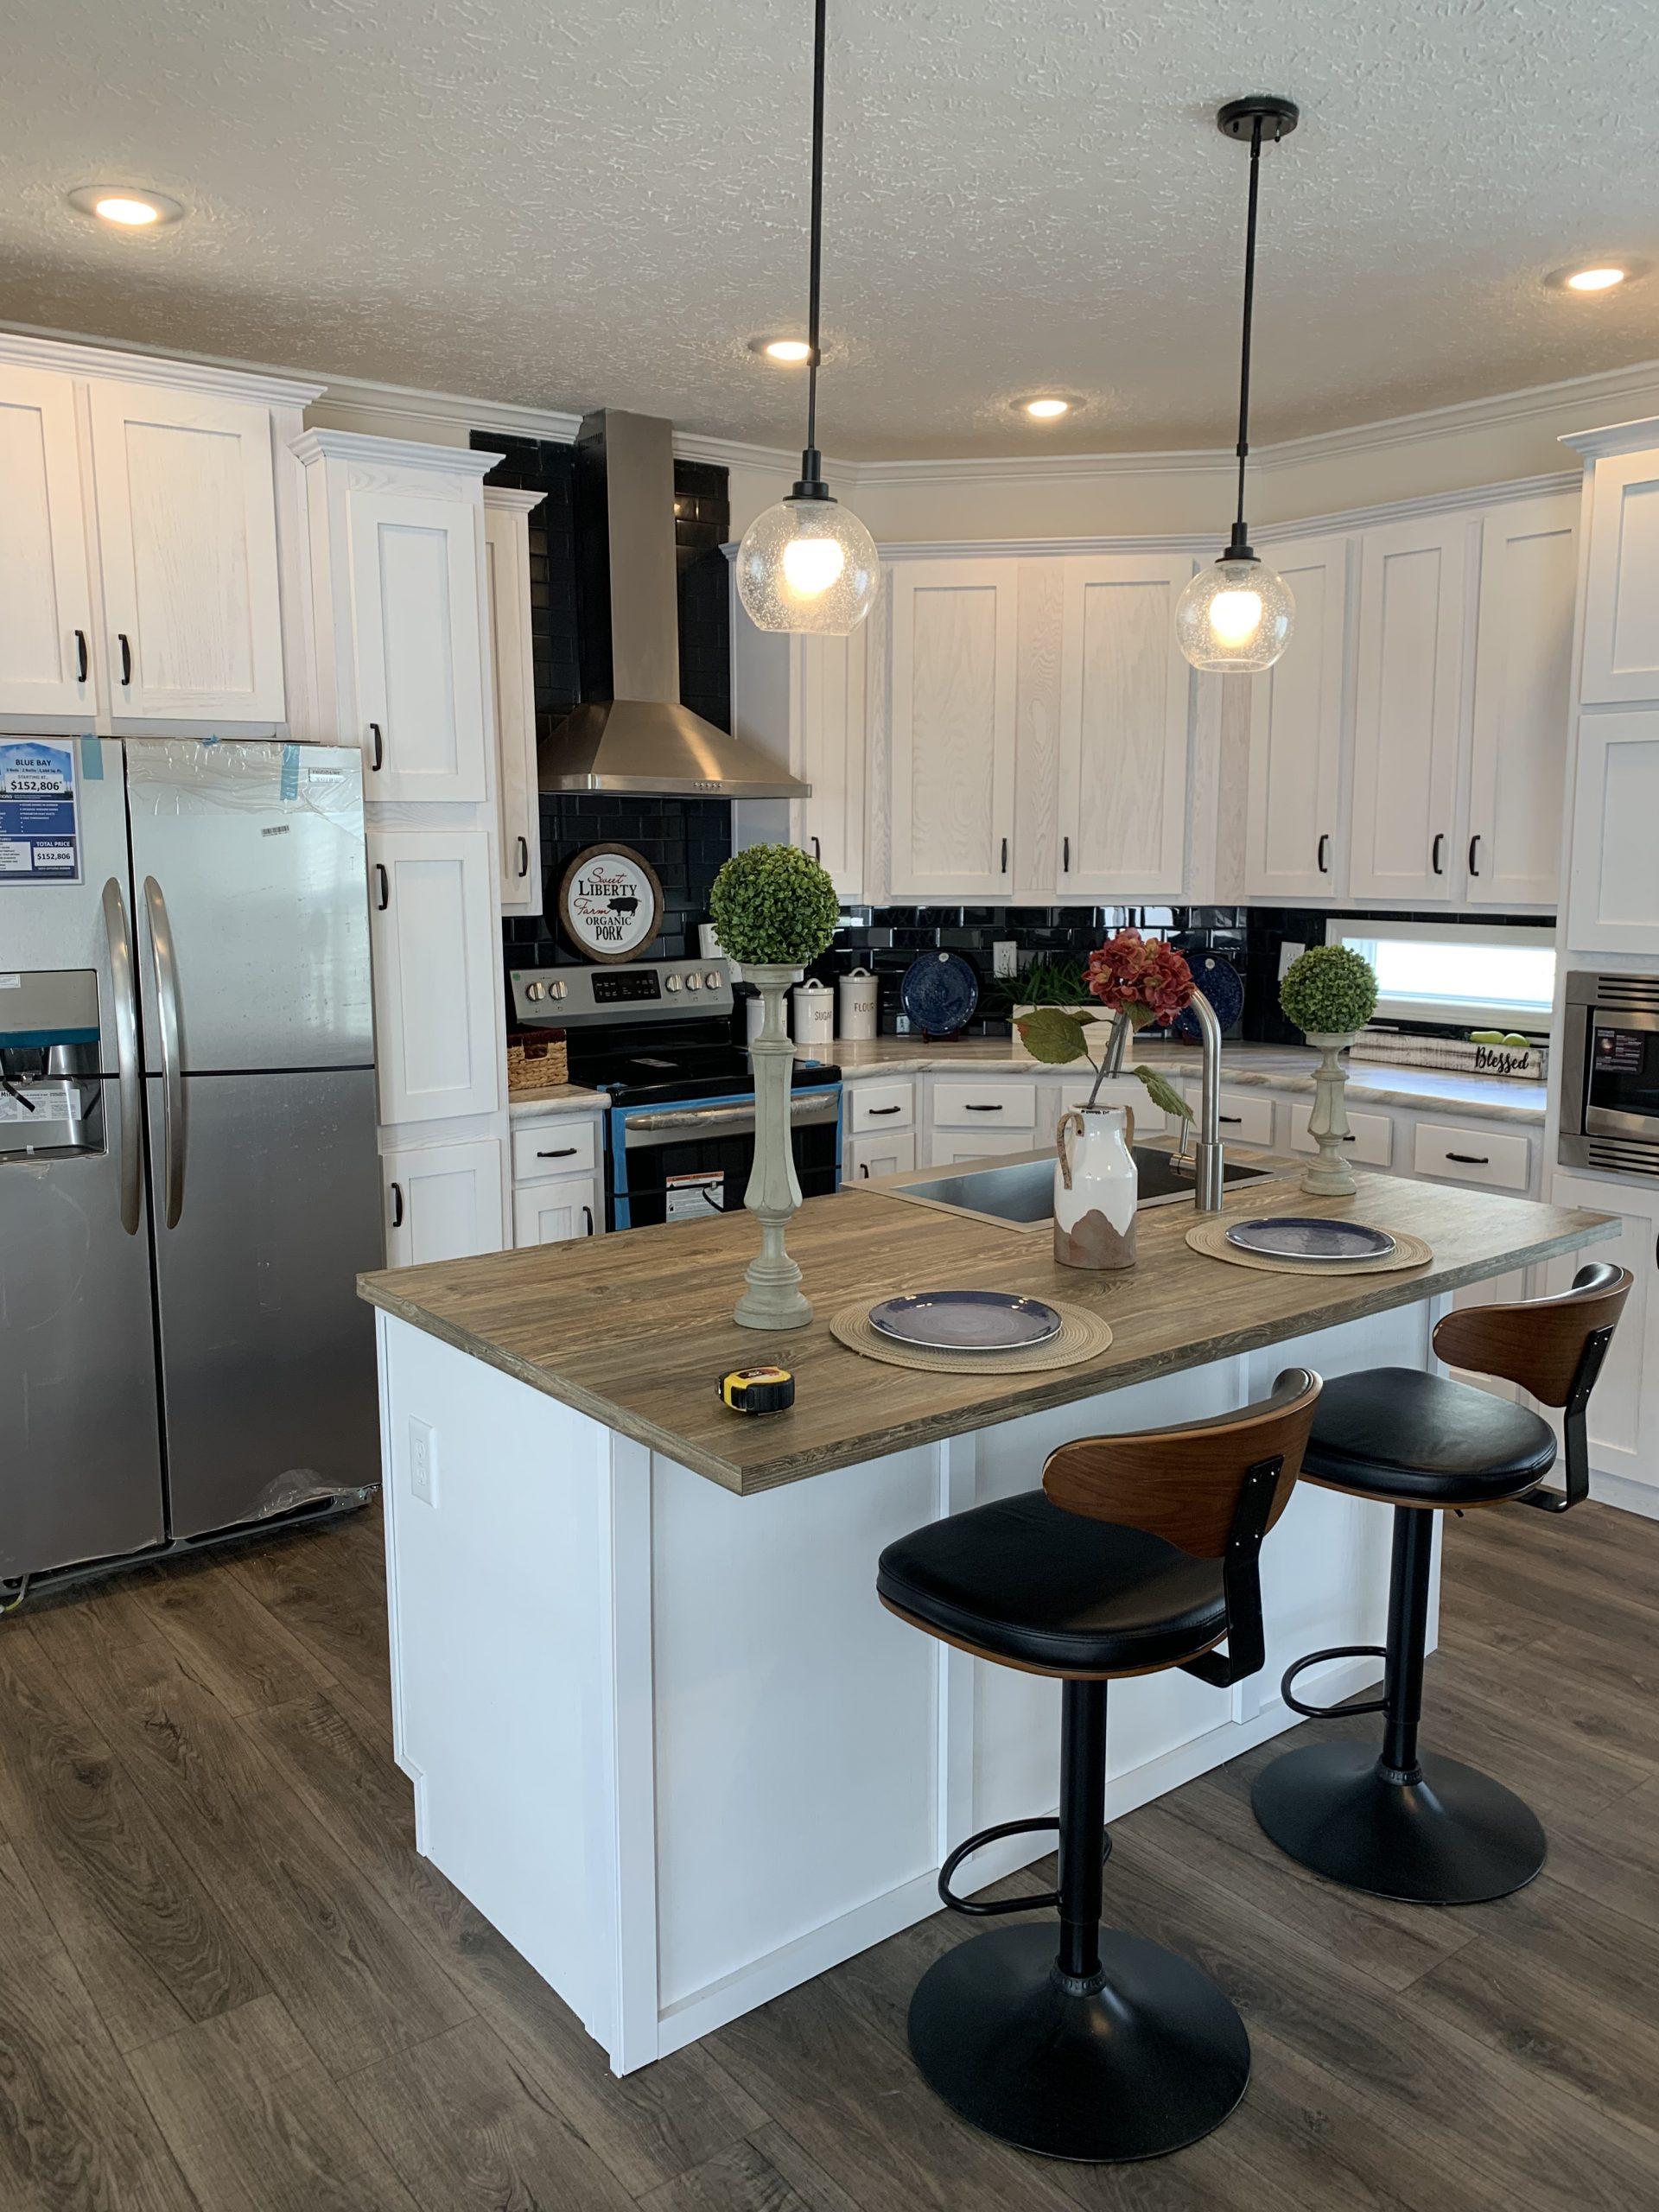 model home kitchen with White Island, barstools, stainless steel range chimney hood, tile backsplash, white kitchen basinets.